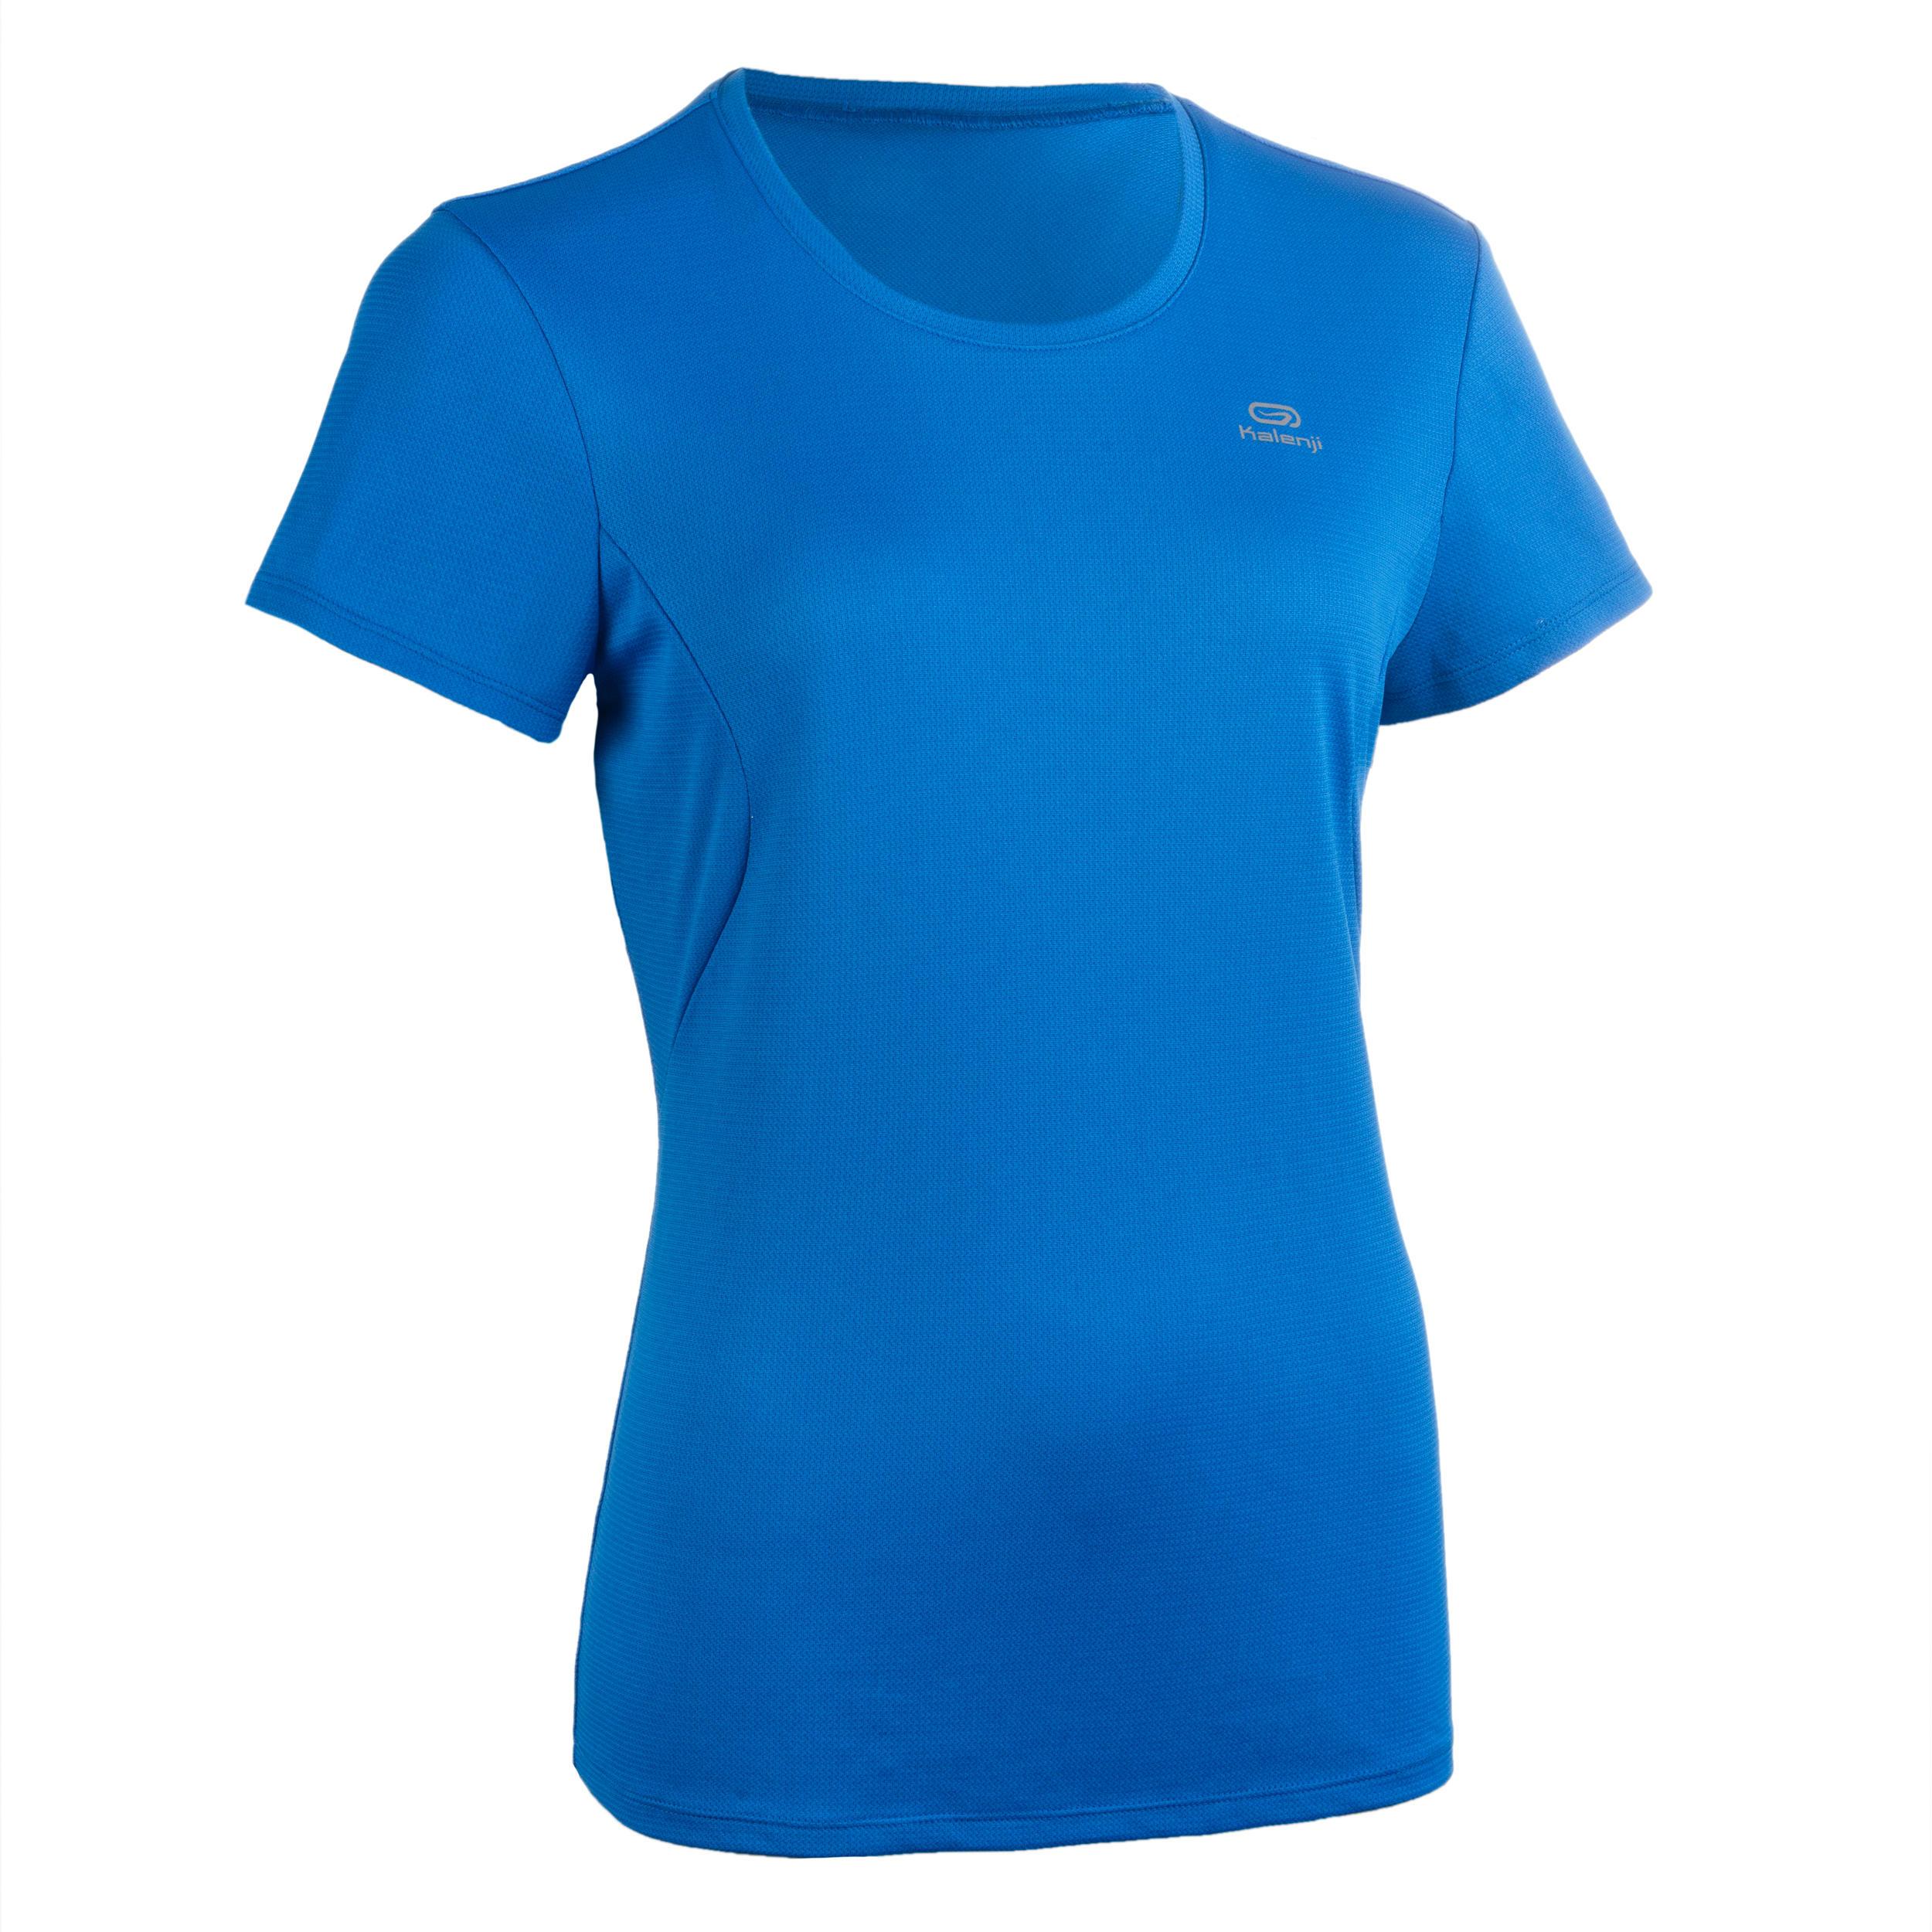 Kalenji Atletiek-T-shirt dames club personaliseerbaar